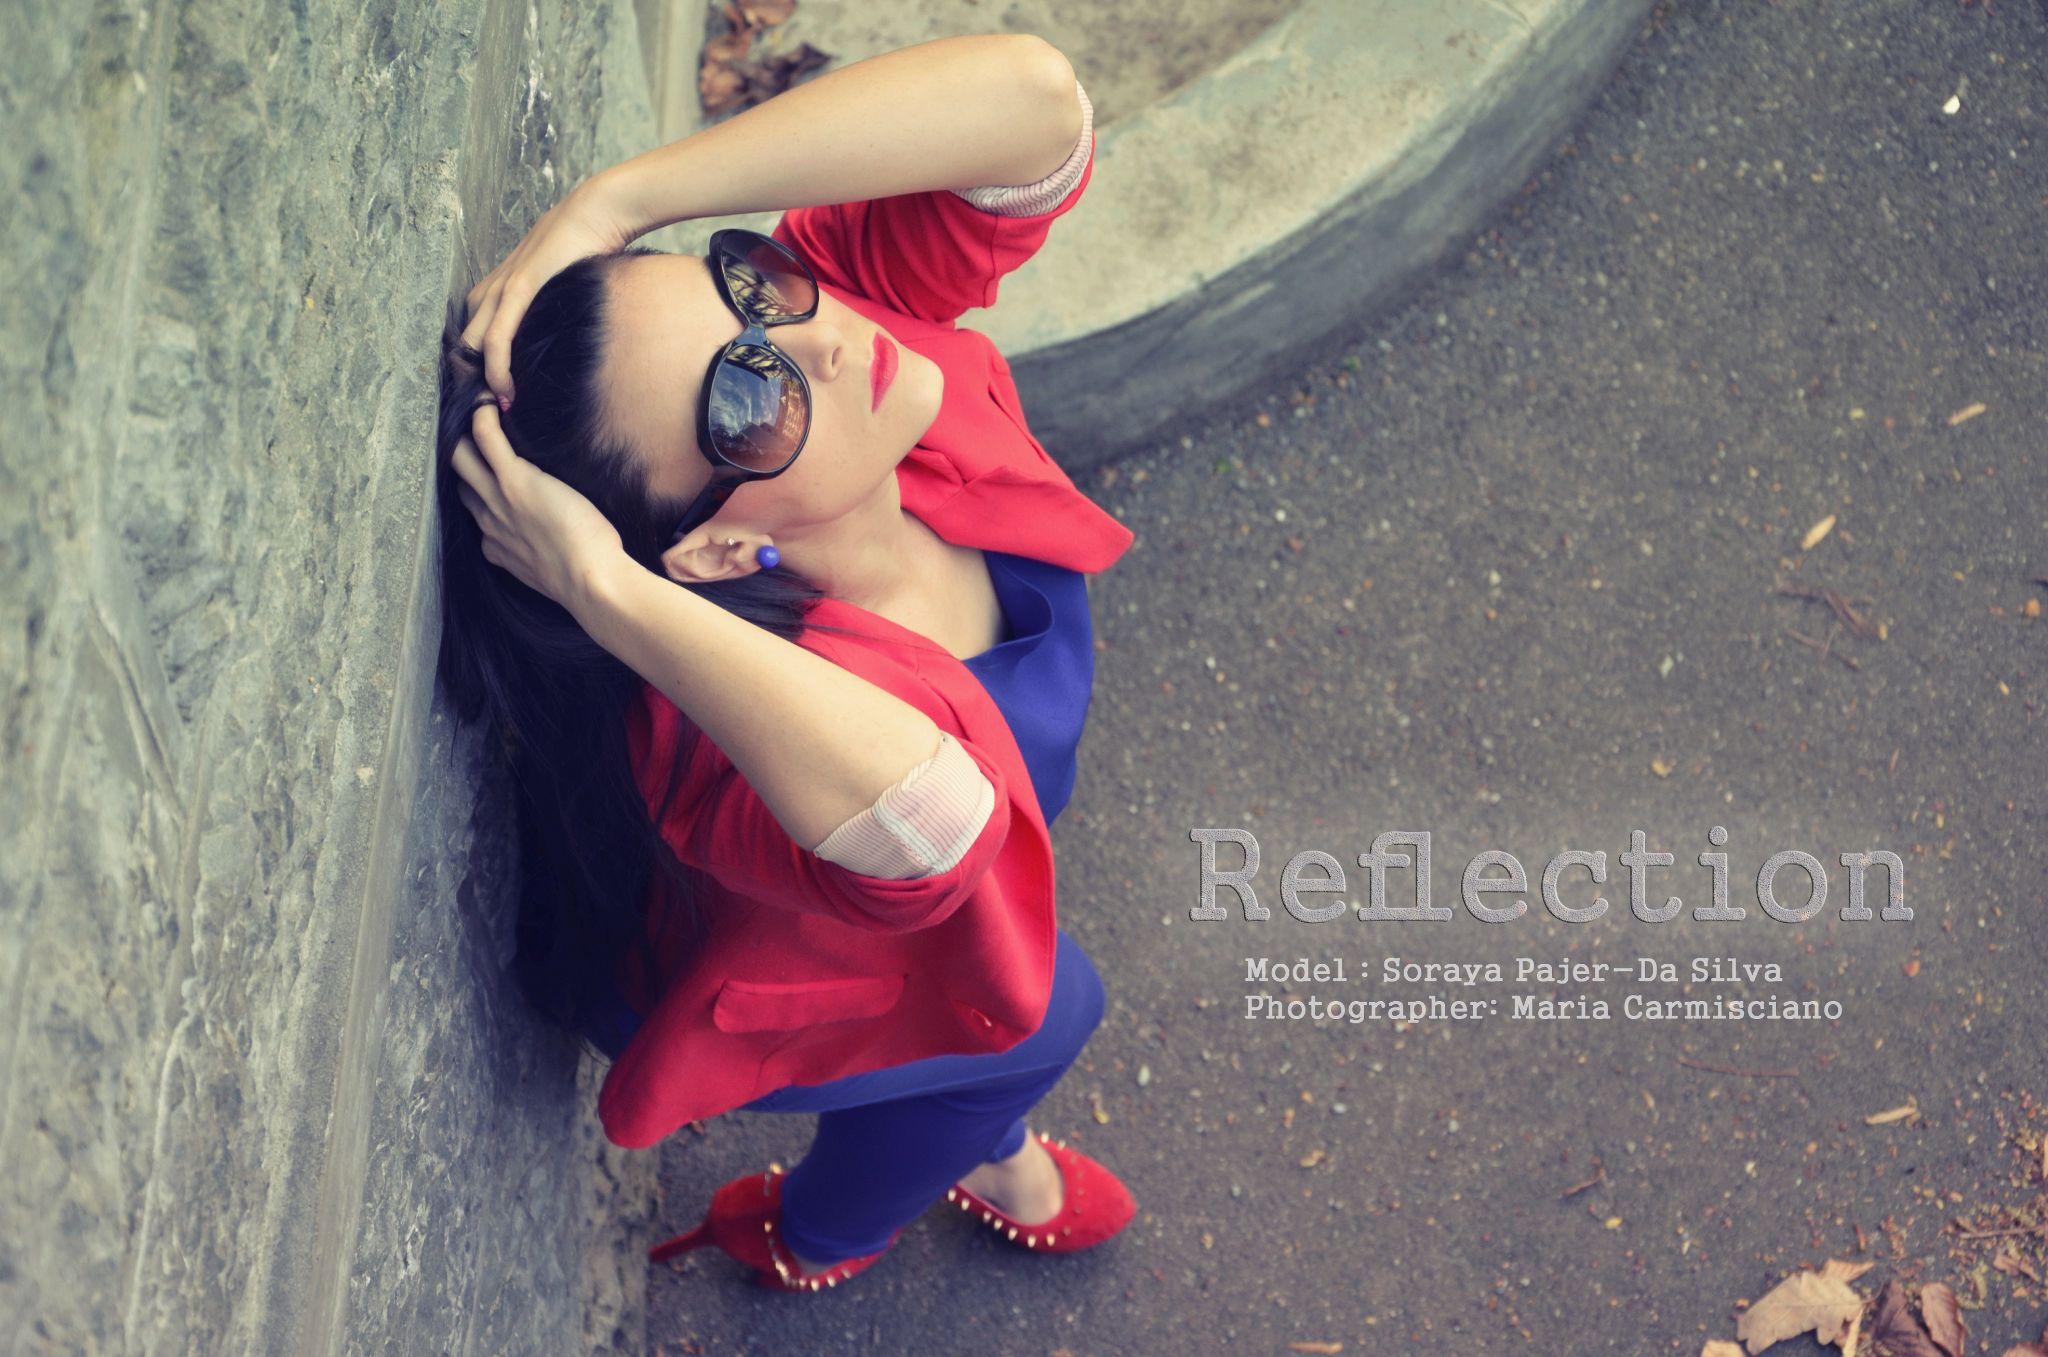 Reflection by mariacarmiscianoph